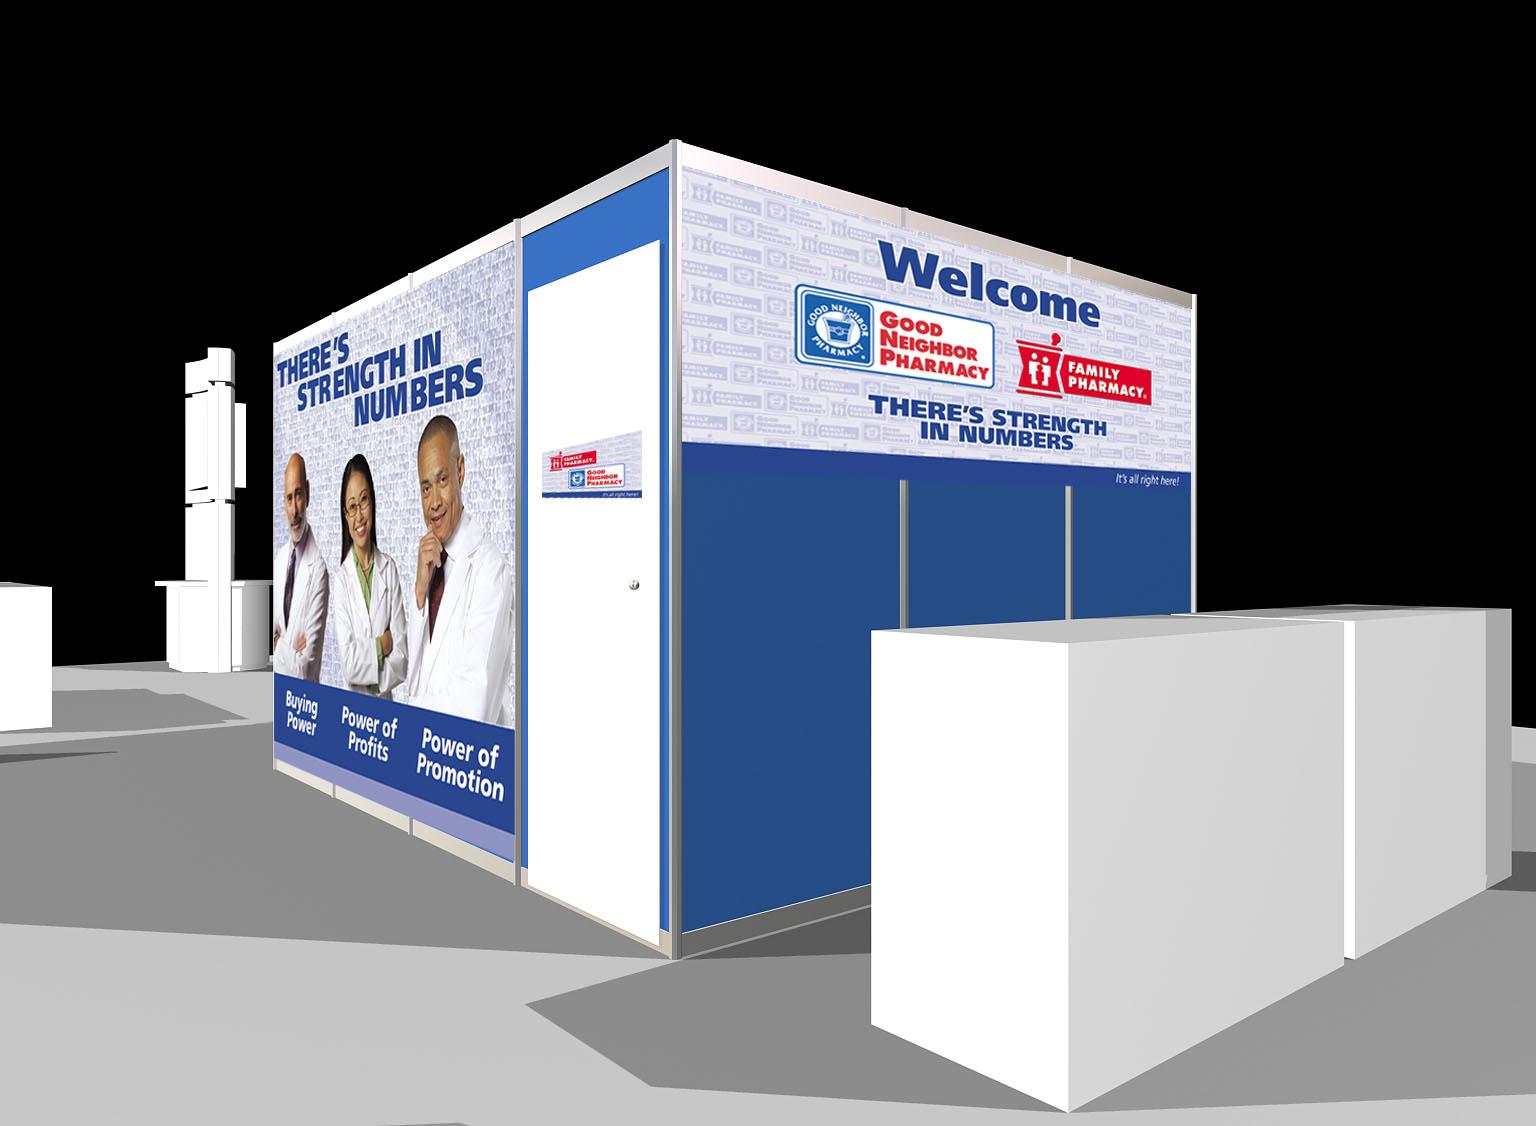 AmerisourceBergen Trade Show Booth Graphics